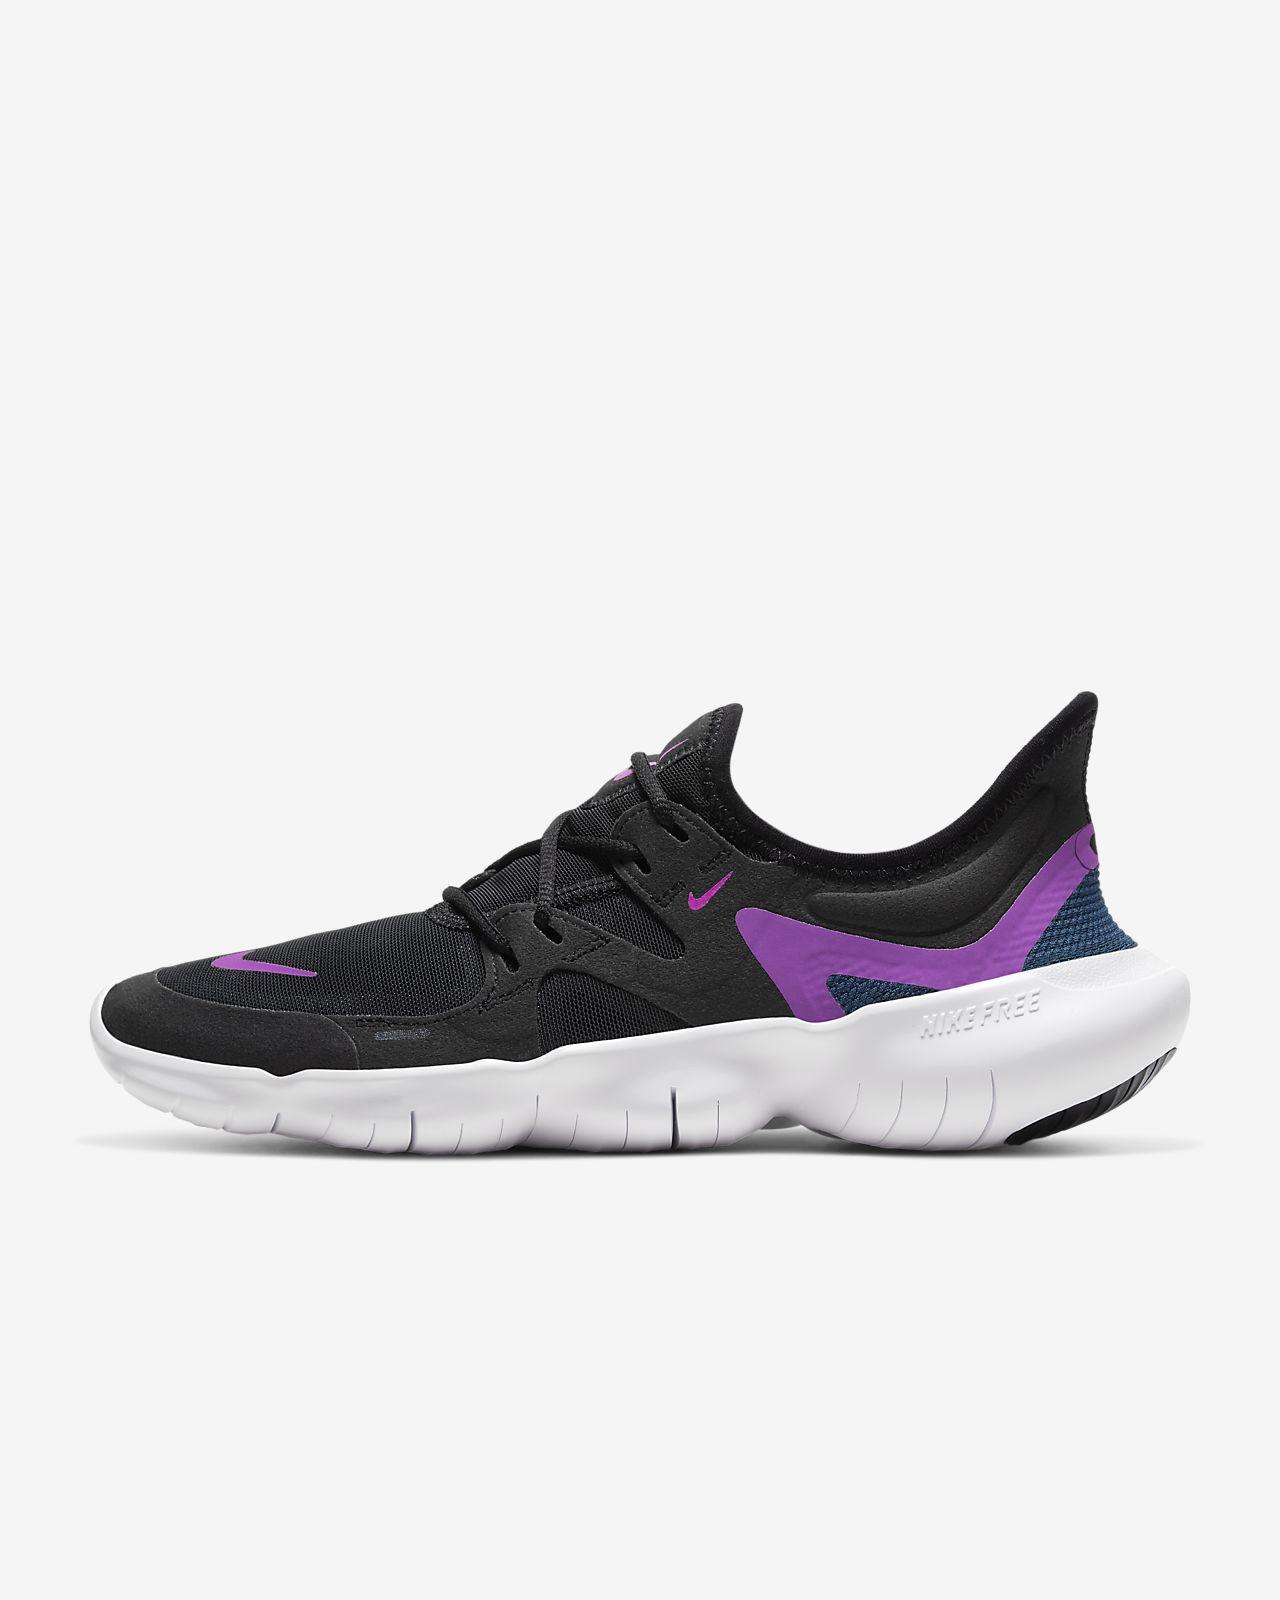 Nike Free RN 5.0 Hardloopschoen voor dames